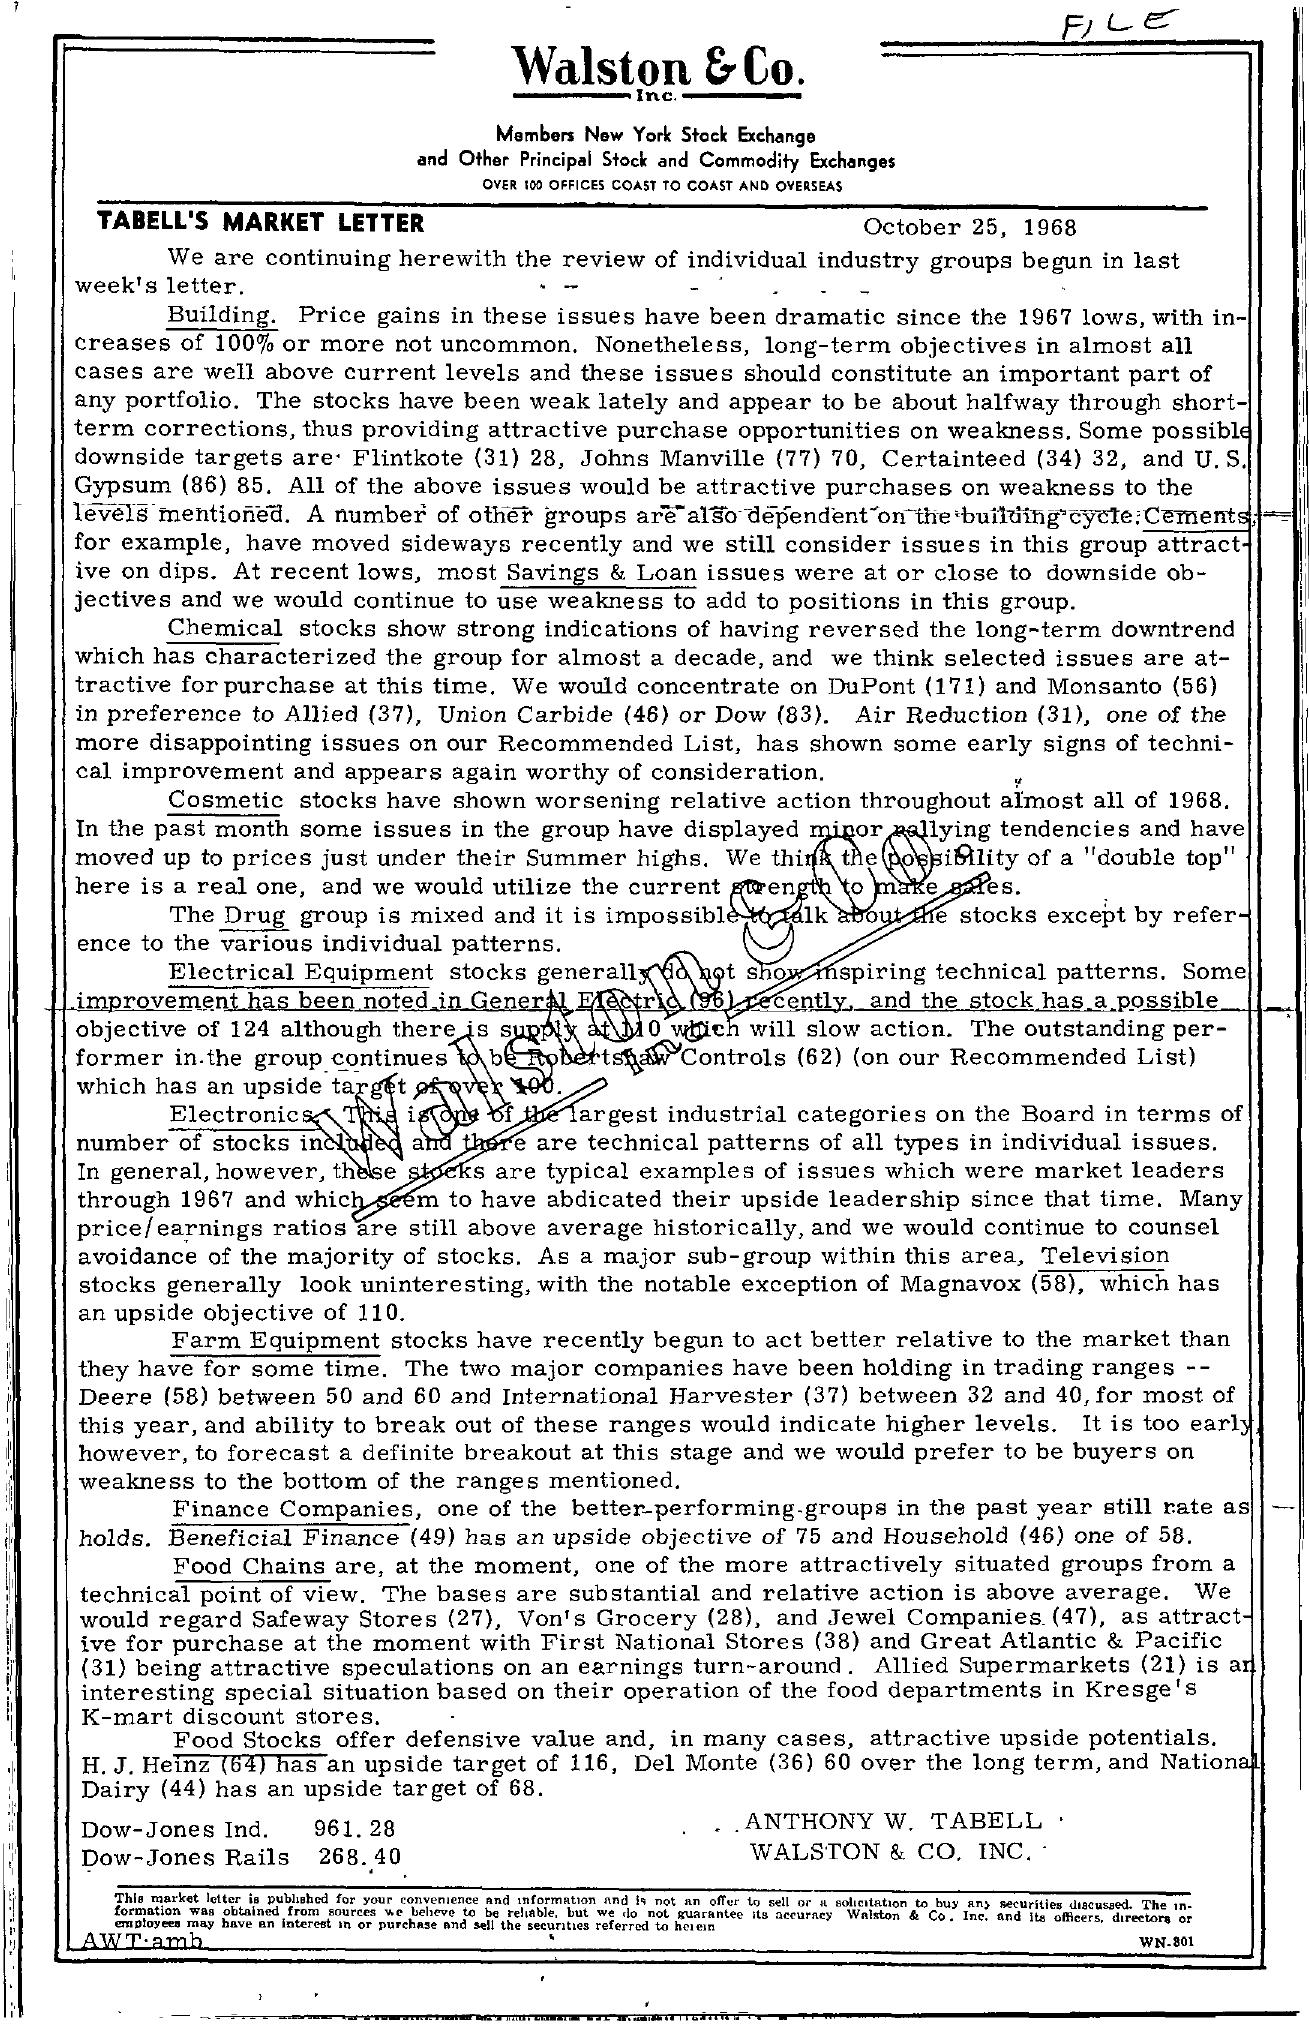 Tabell's Market Letter - October 25, 1968